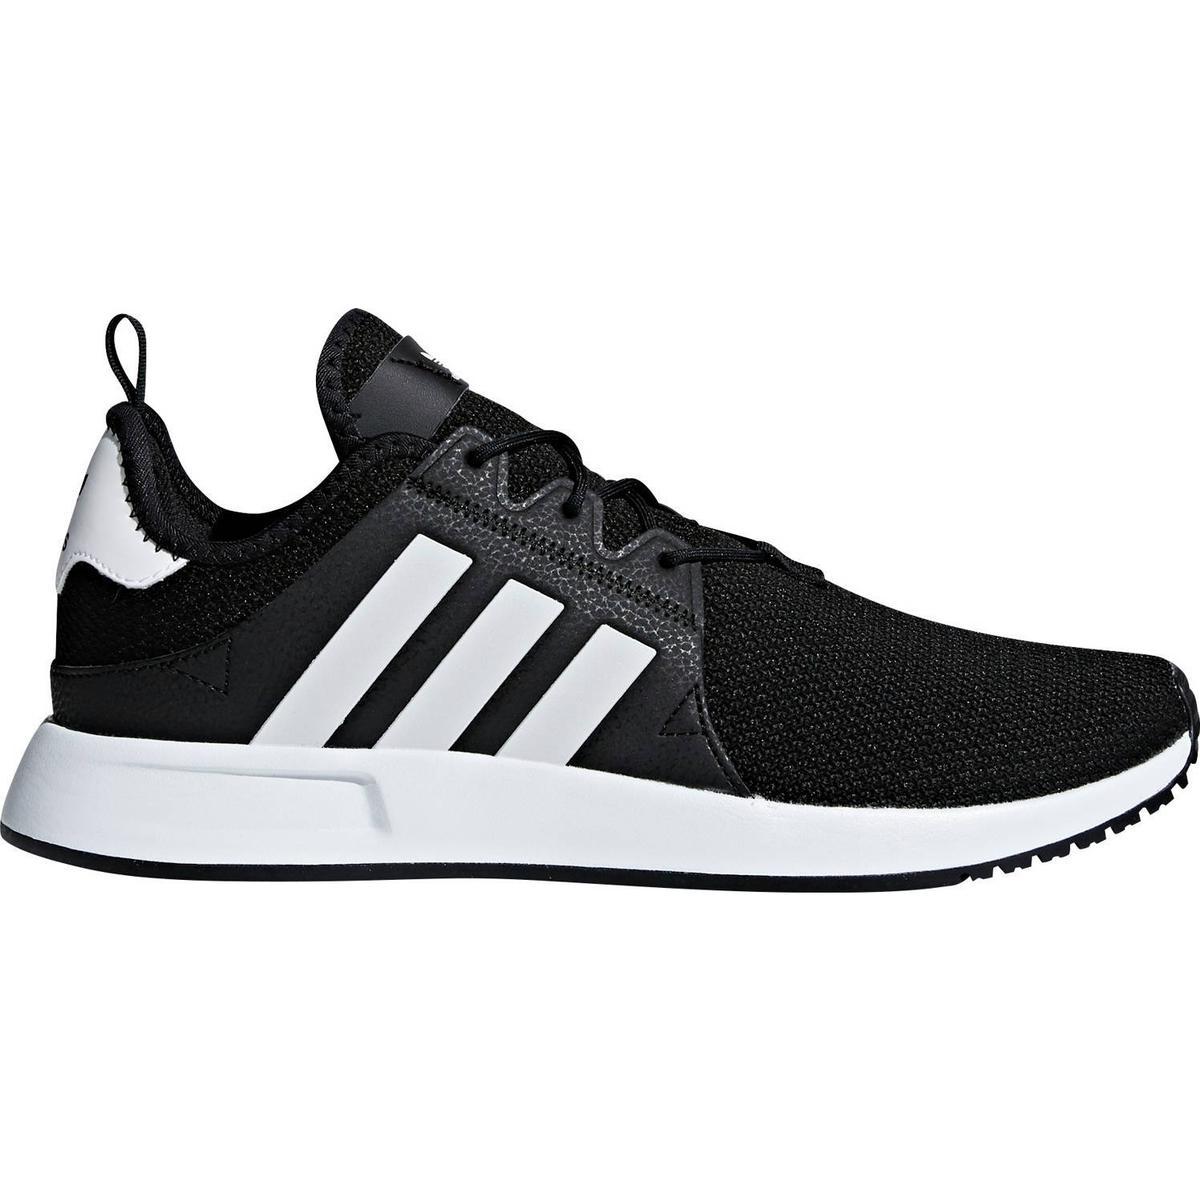 Adidas Men's X_PLR Sneakers